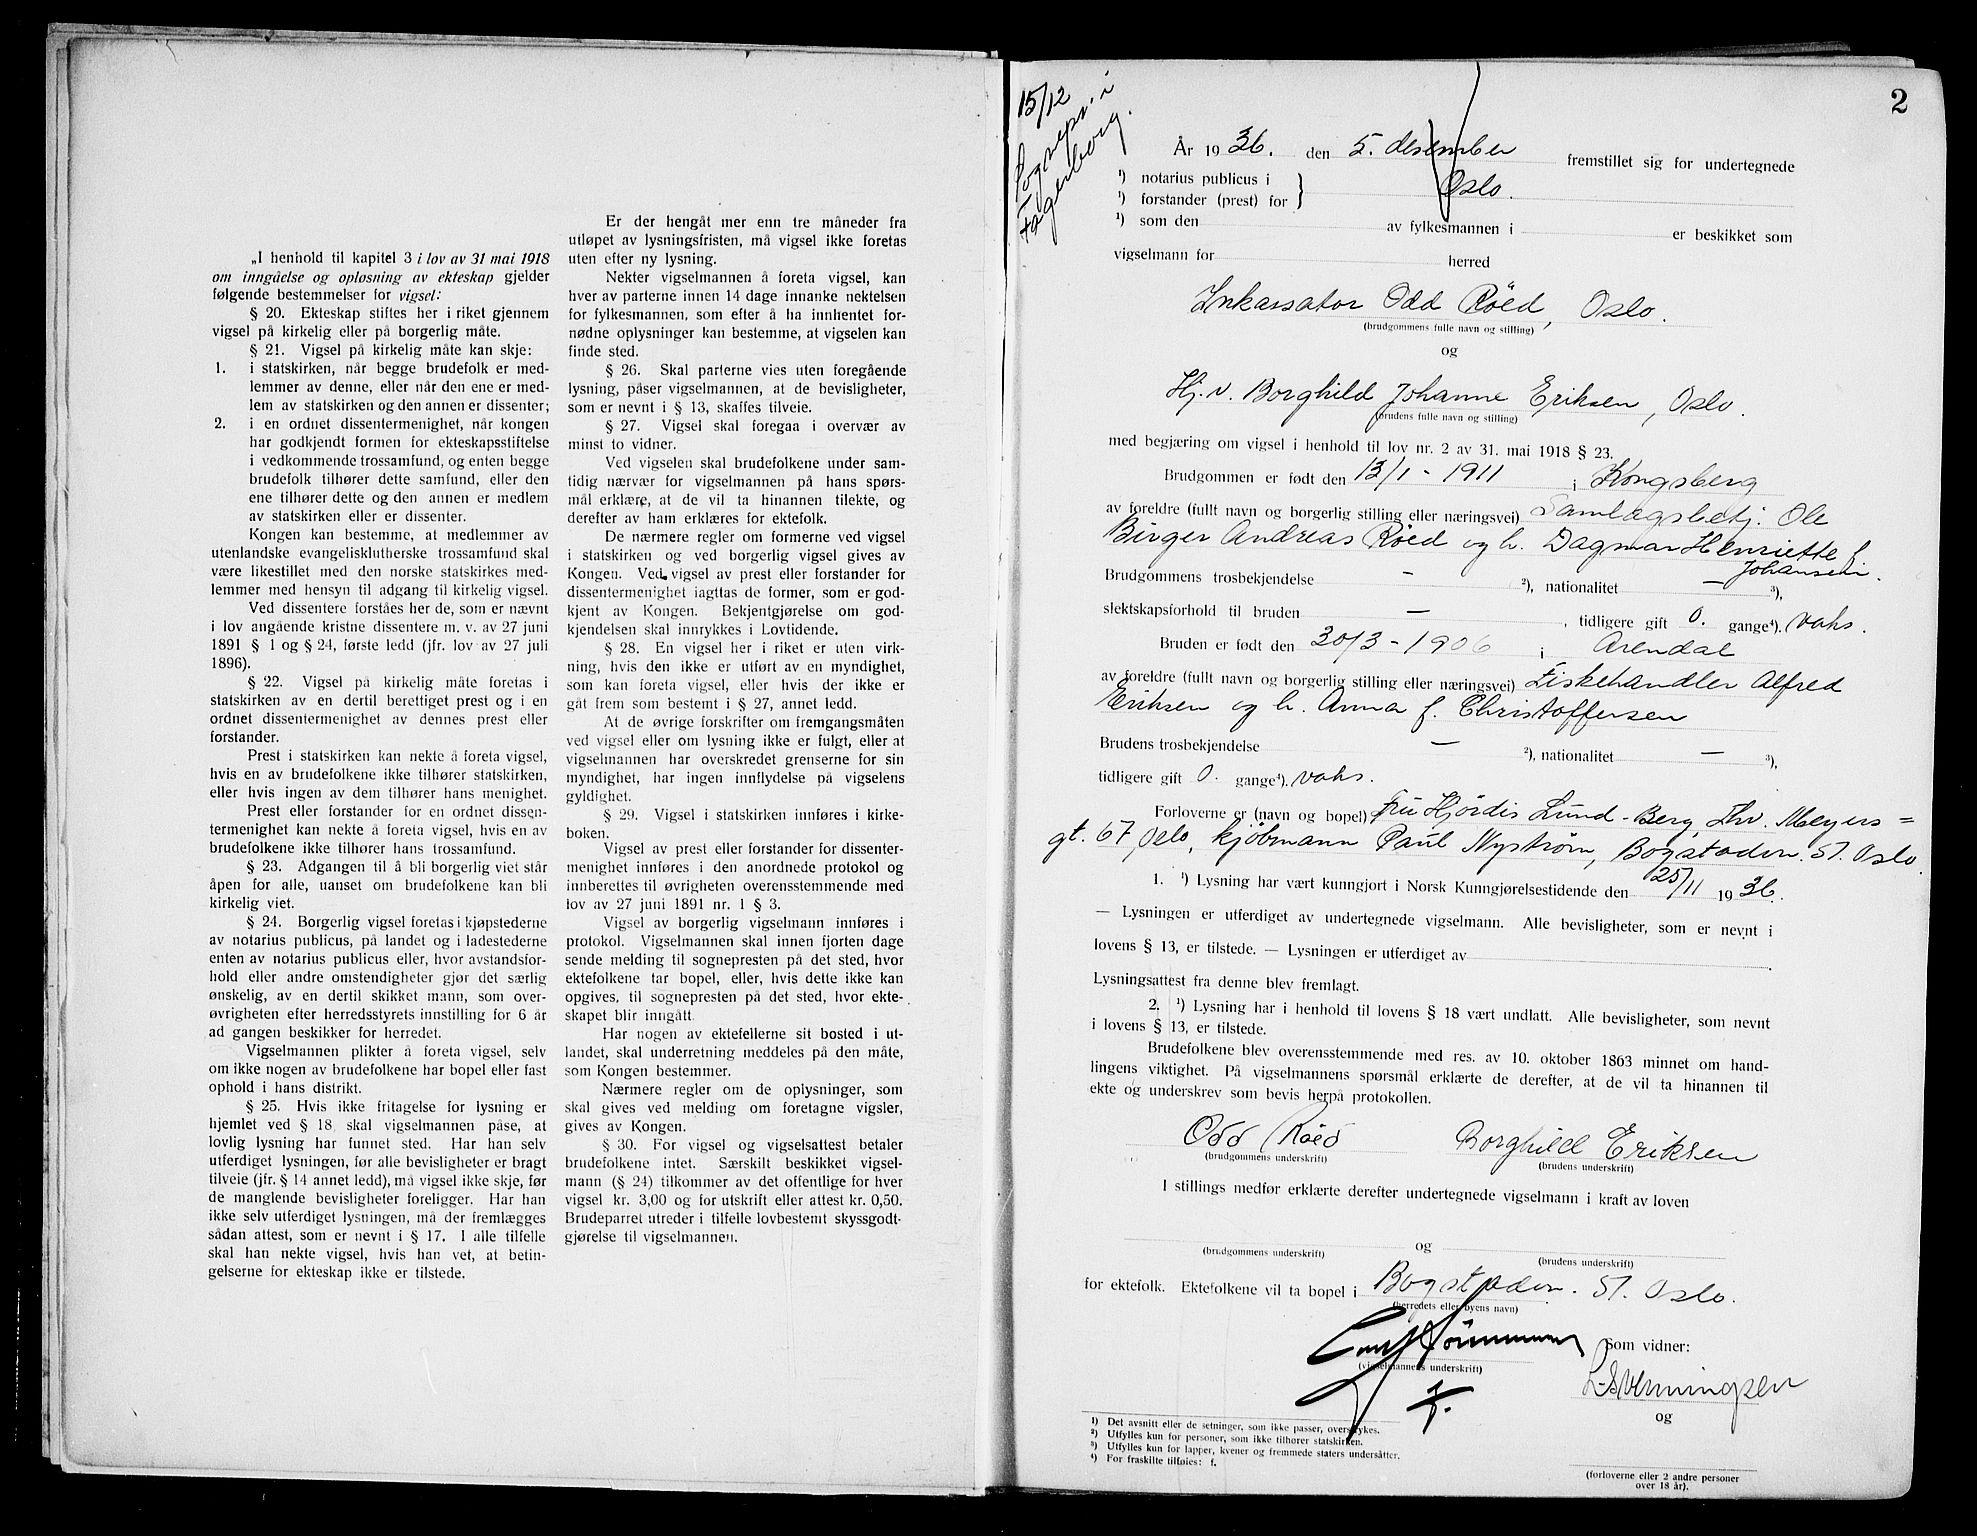 SAO, Oslo byfogd avd. I, L/Lb/Lbb/L0027: Notarialprotokoll, rekke II: Vigsler, 1936-1937, s. 1b-2a